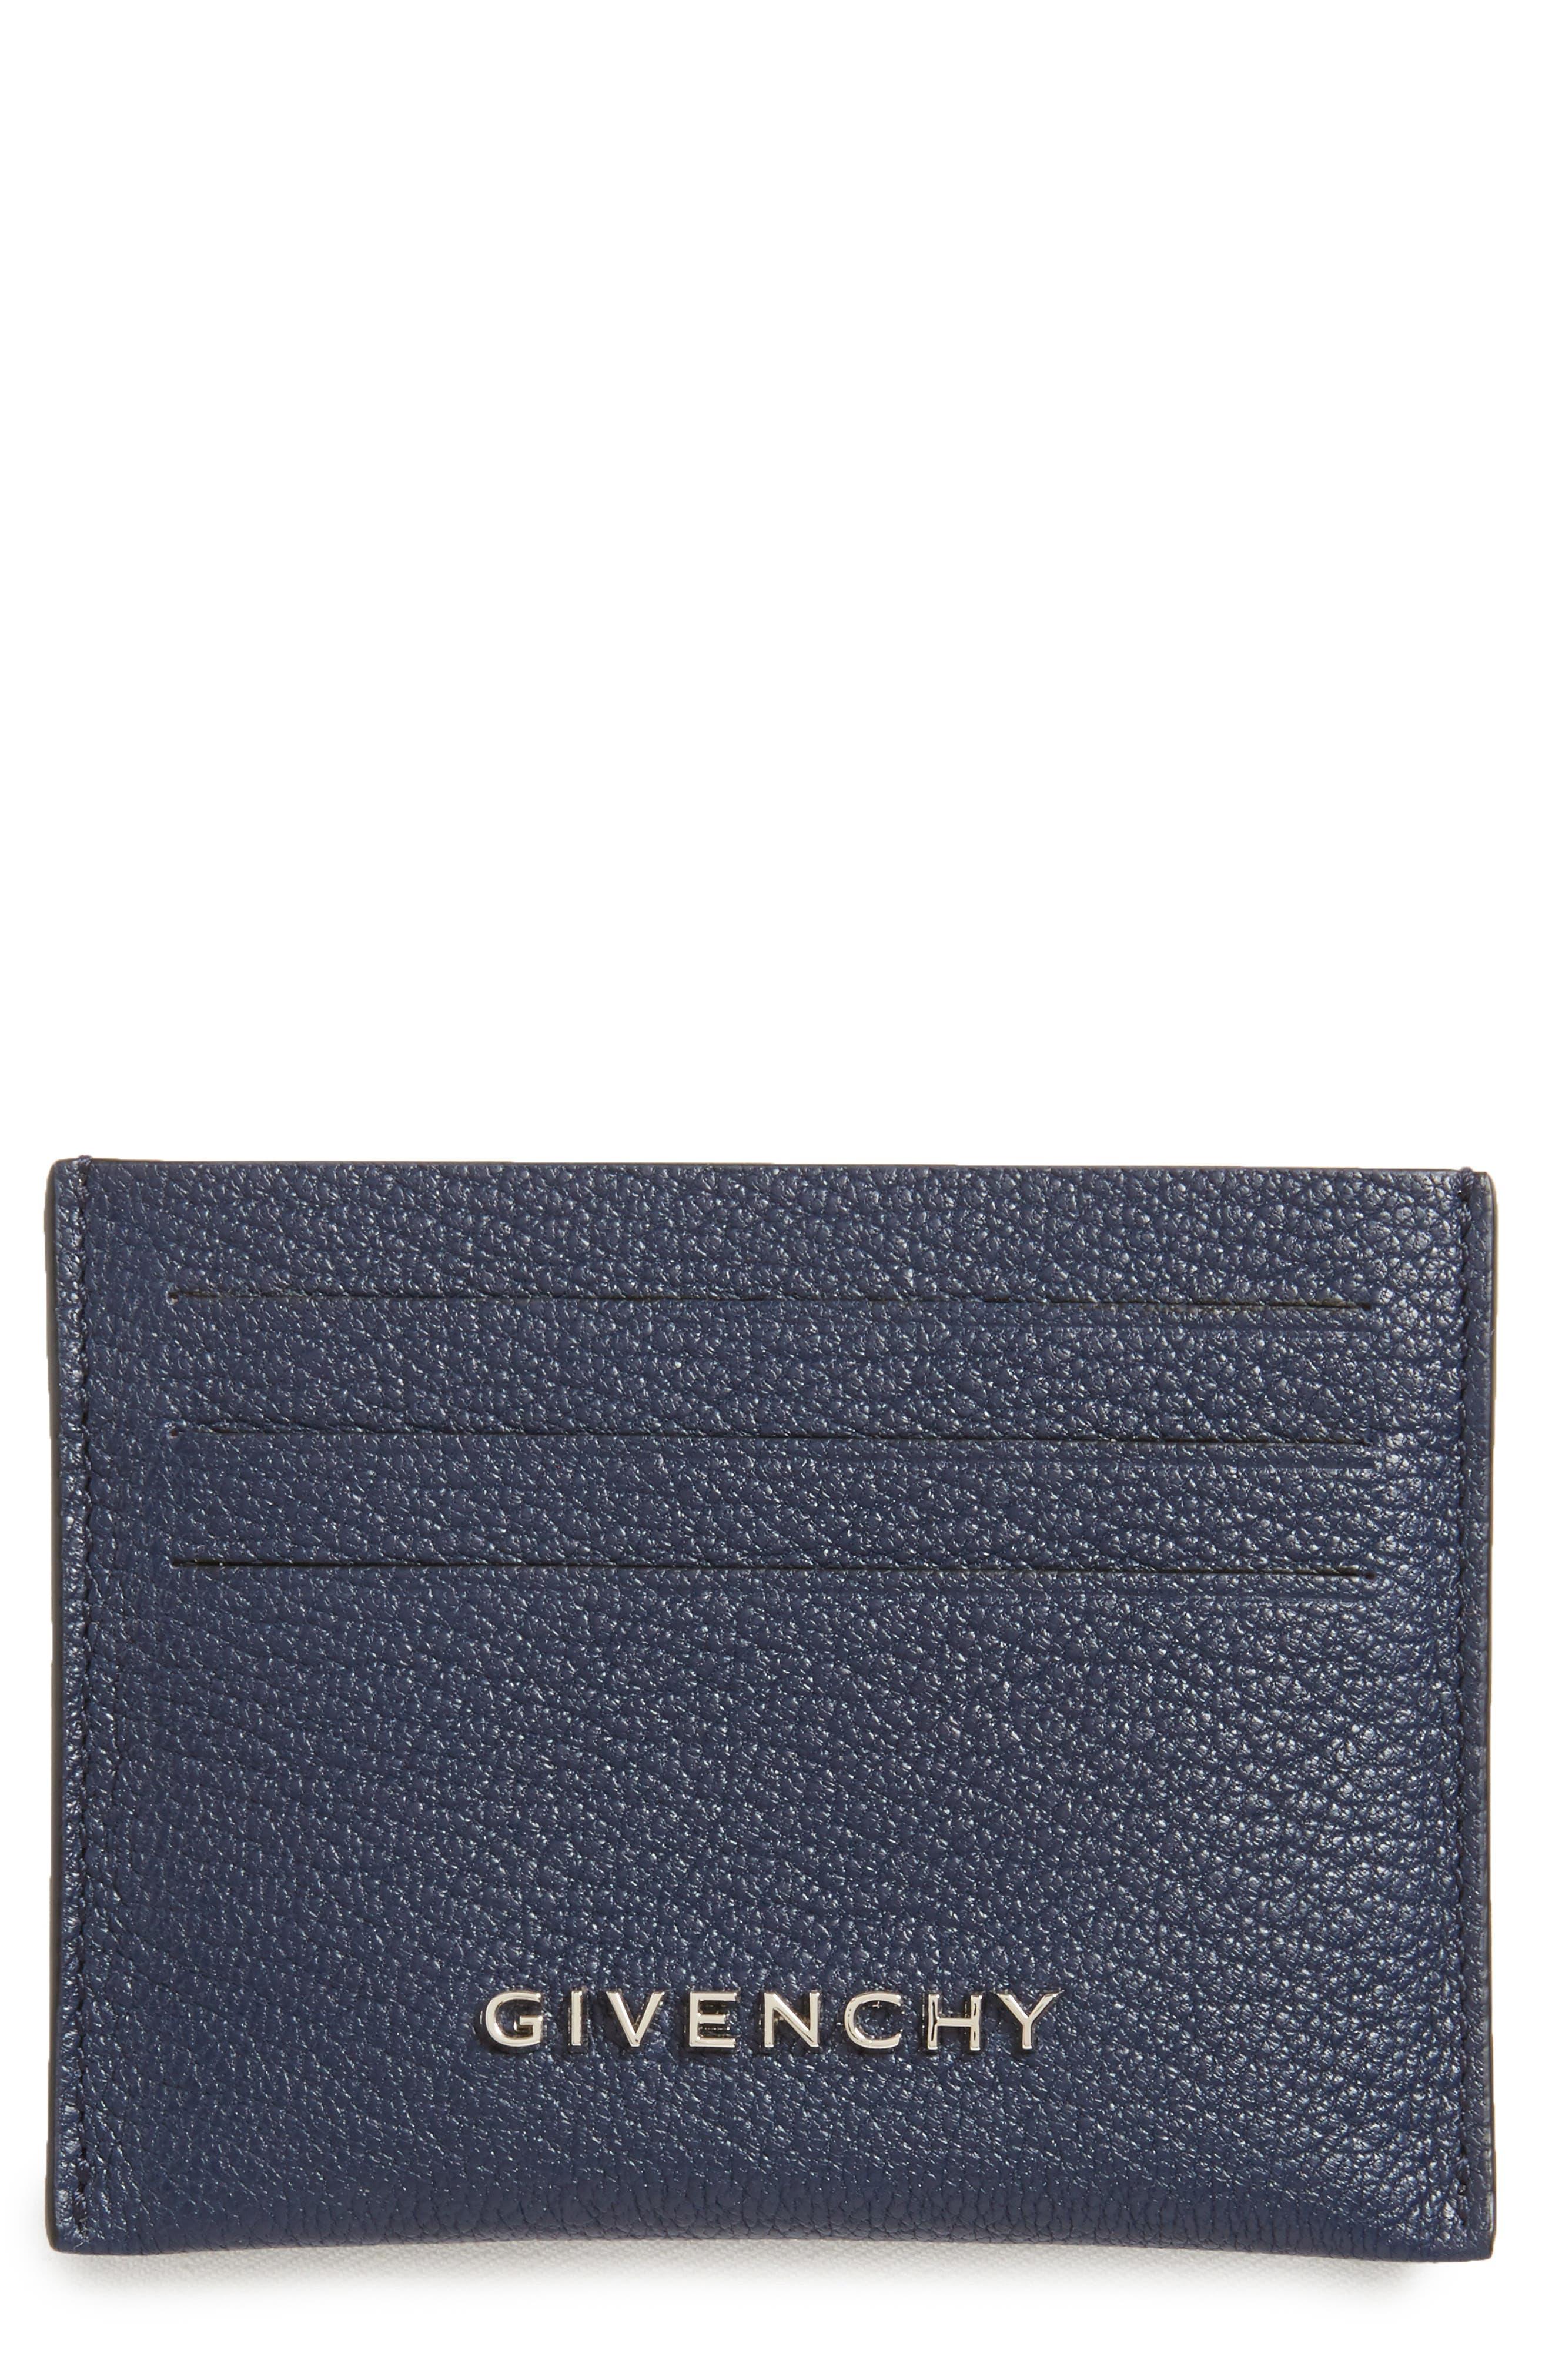 'Pandora' Card Case,                             Main thumbnail 1, color,                             Night Blue